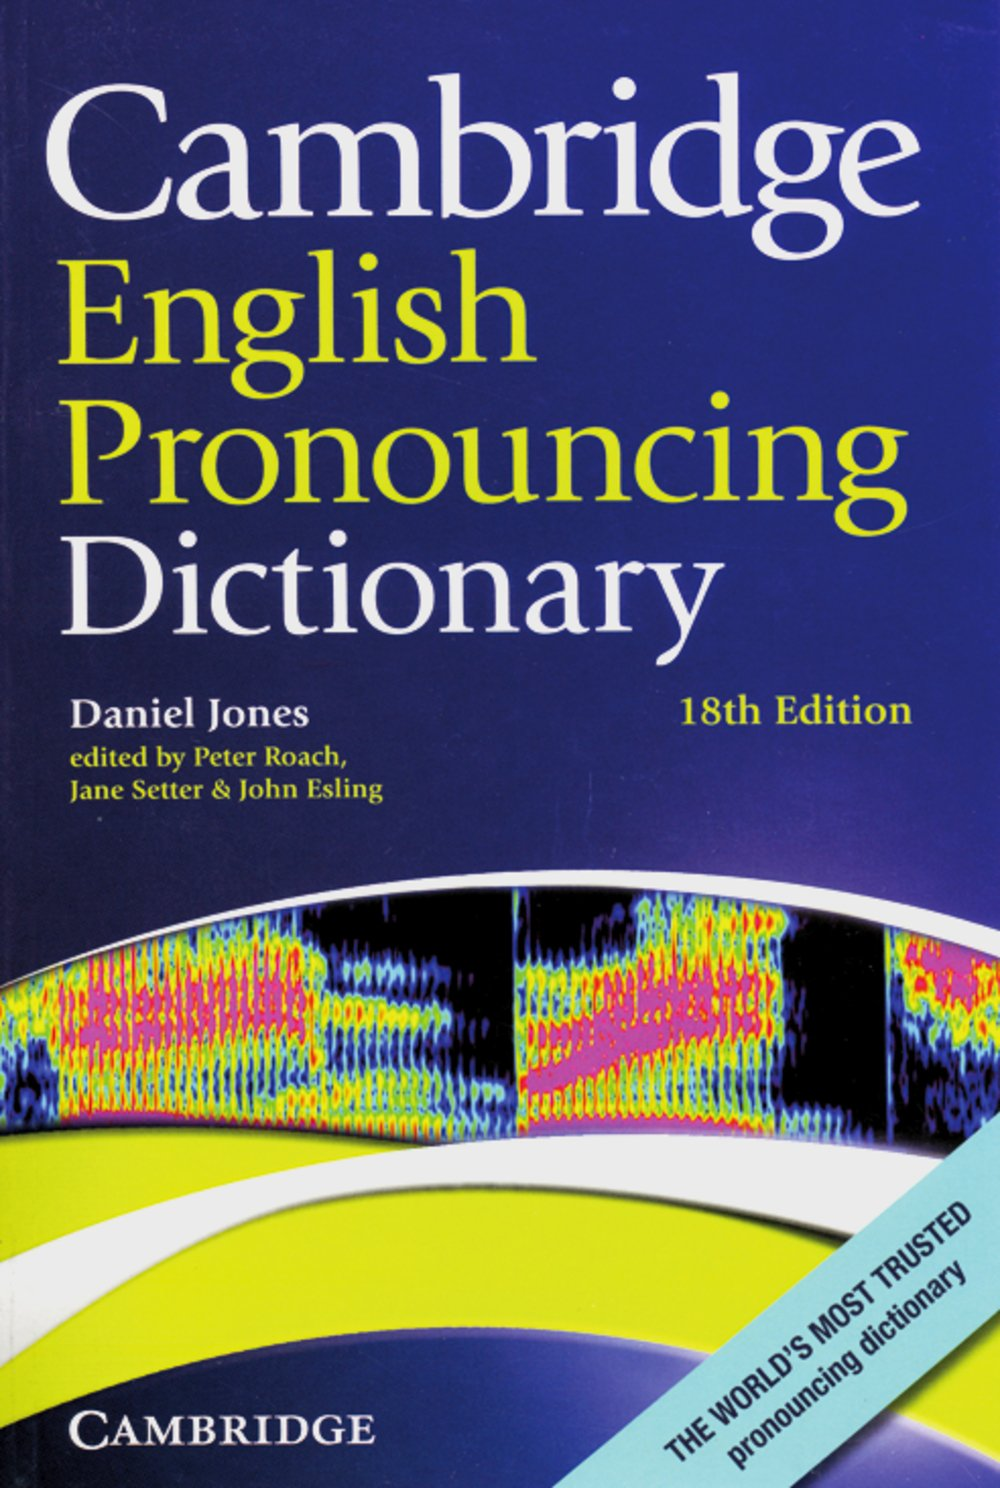 Cambridge English Pronouncing Dictionary: Eighteenth edition. Paperback